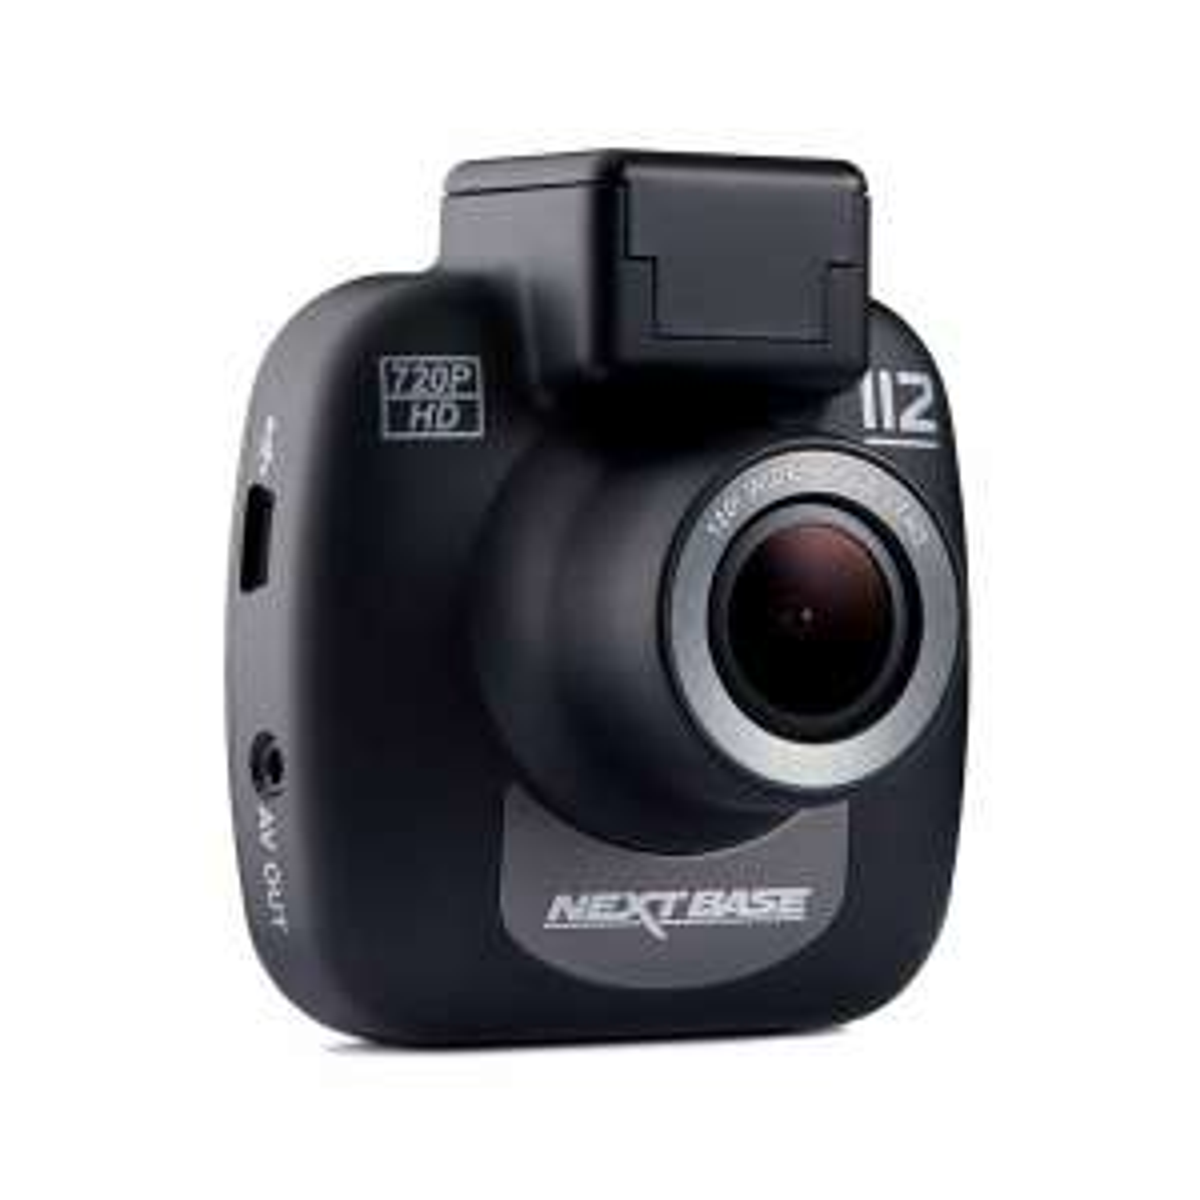 Nextbase 112 Dash Camera 720p HD - £24.99 (+ £3.95 Delivery) @ Ryman